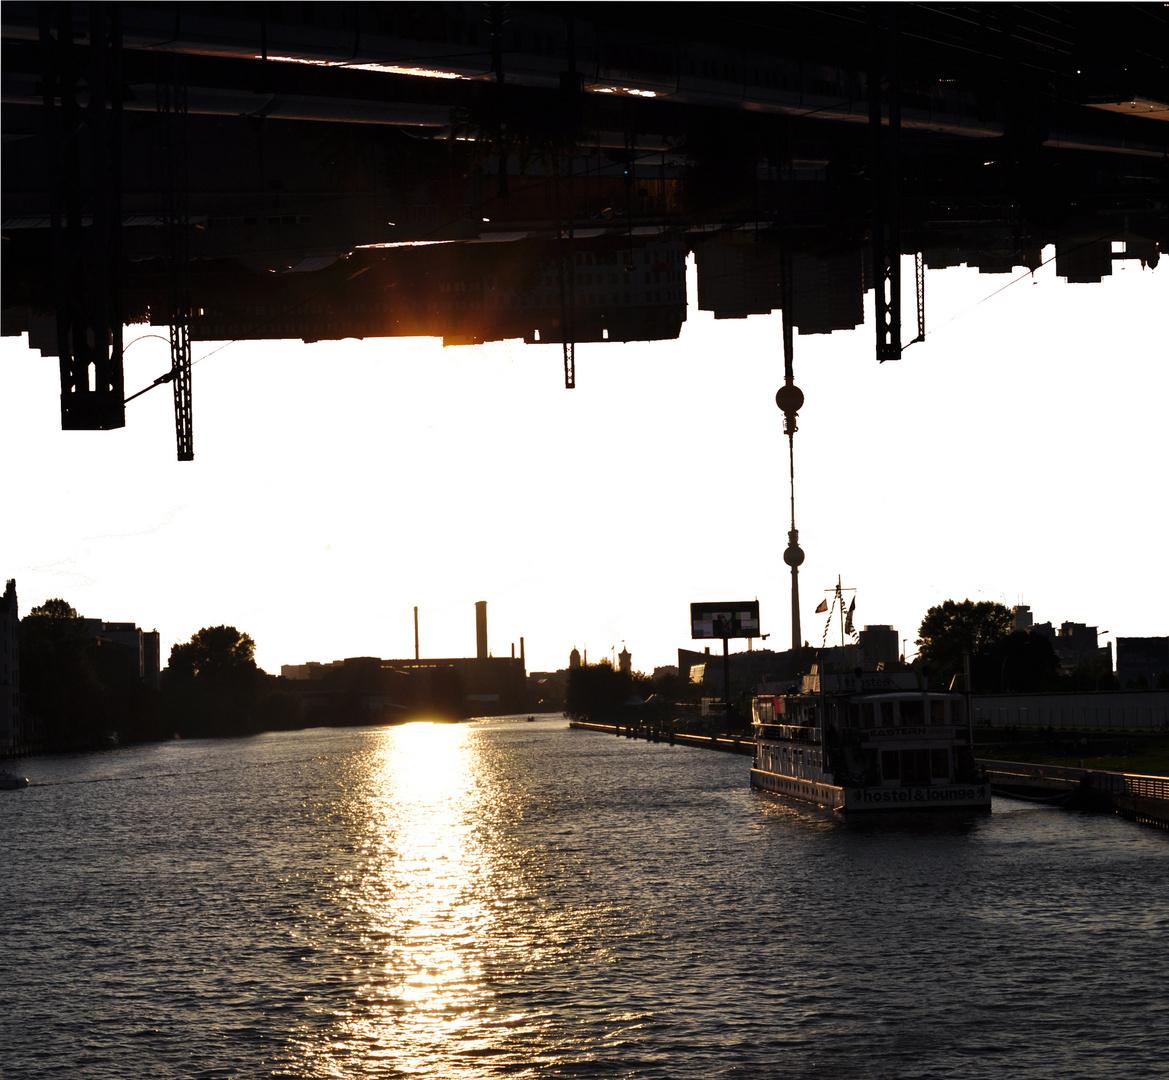 Berlin Sonnenuntegang aus 2 Perpektiven